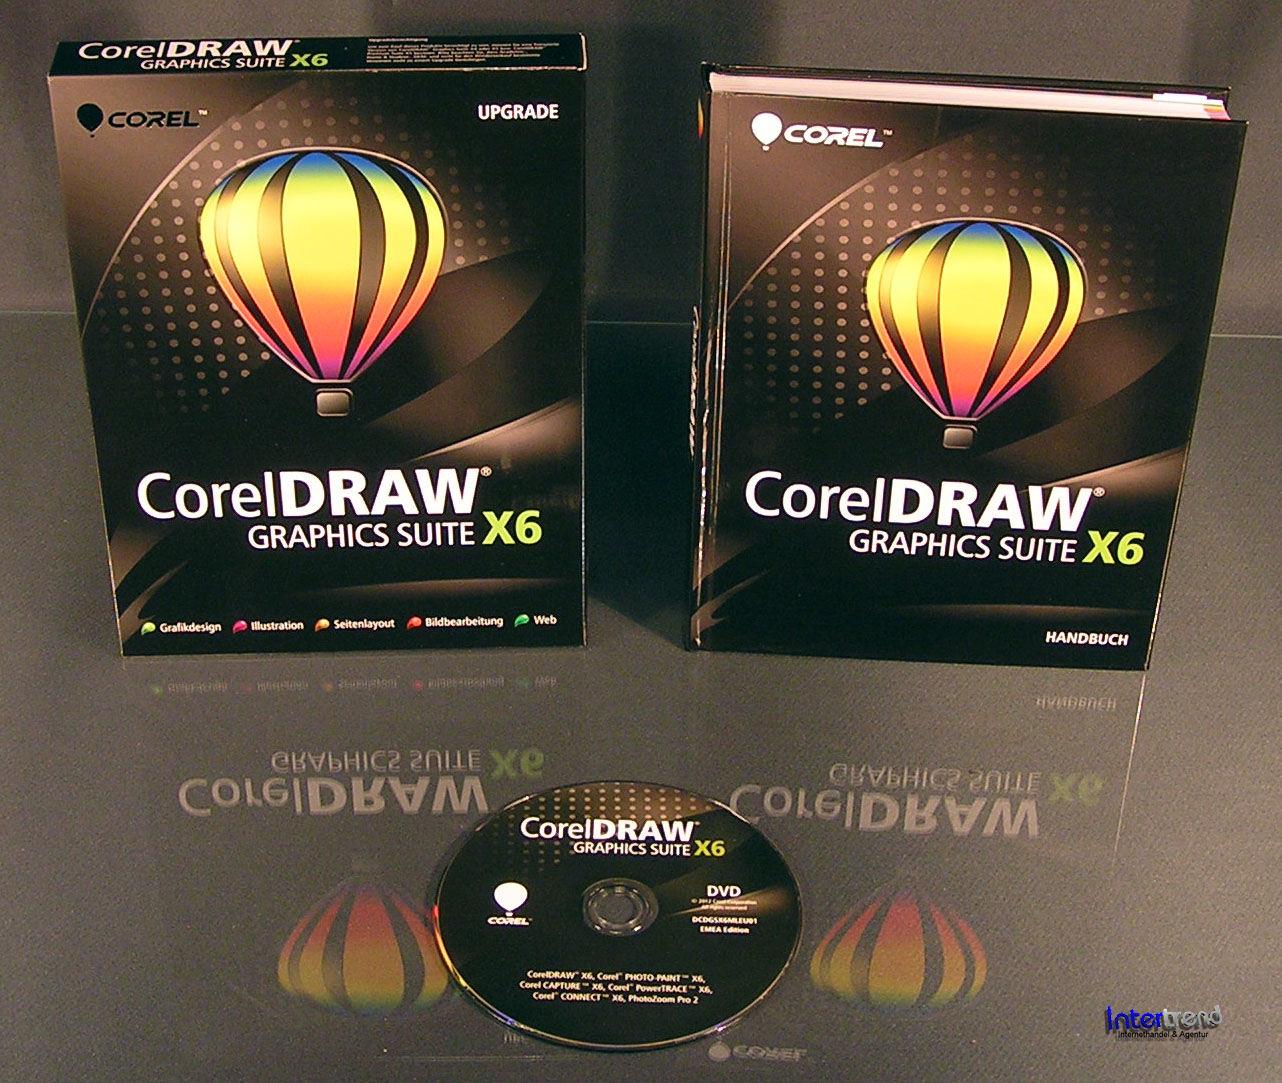 corel draw graphics suite x6 upgrade box cd handbuch. Black Bedroom Furniture Sets. Home Design Ideas